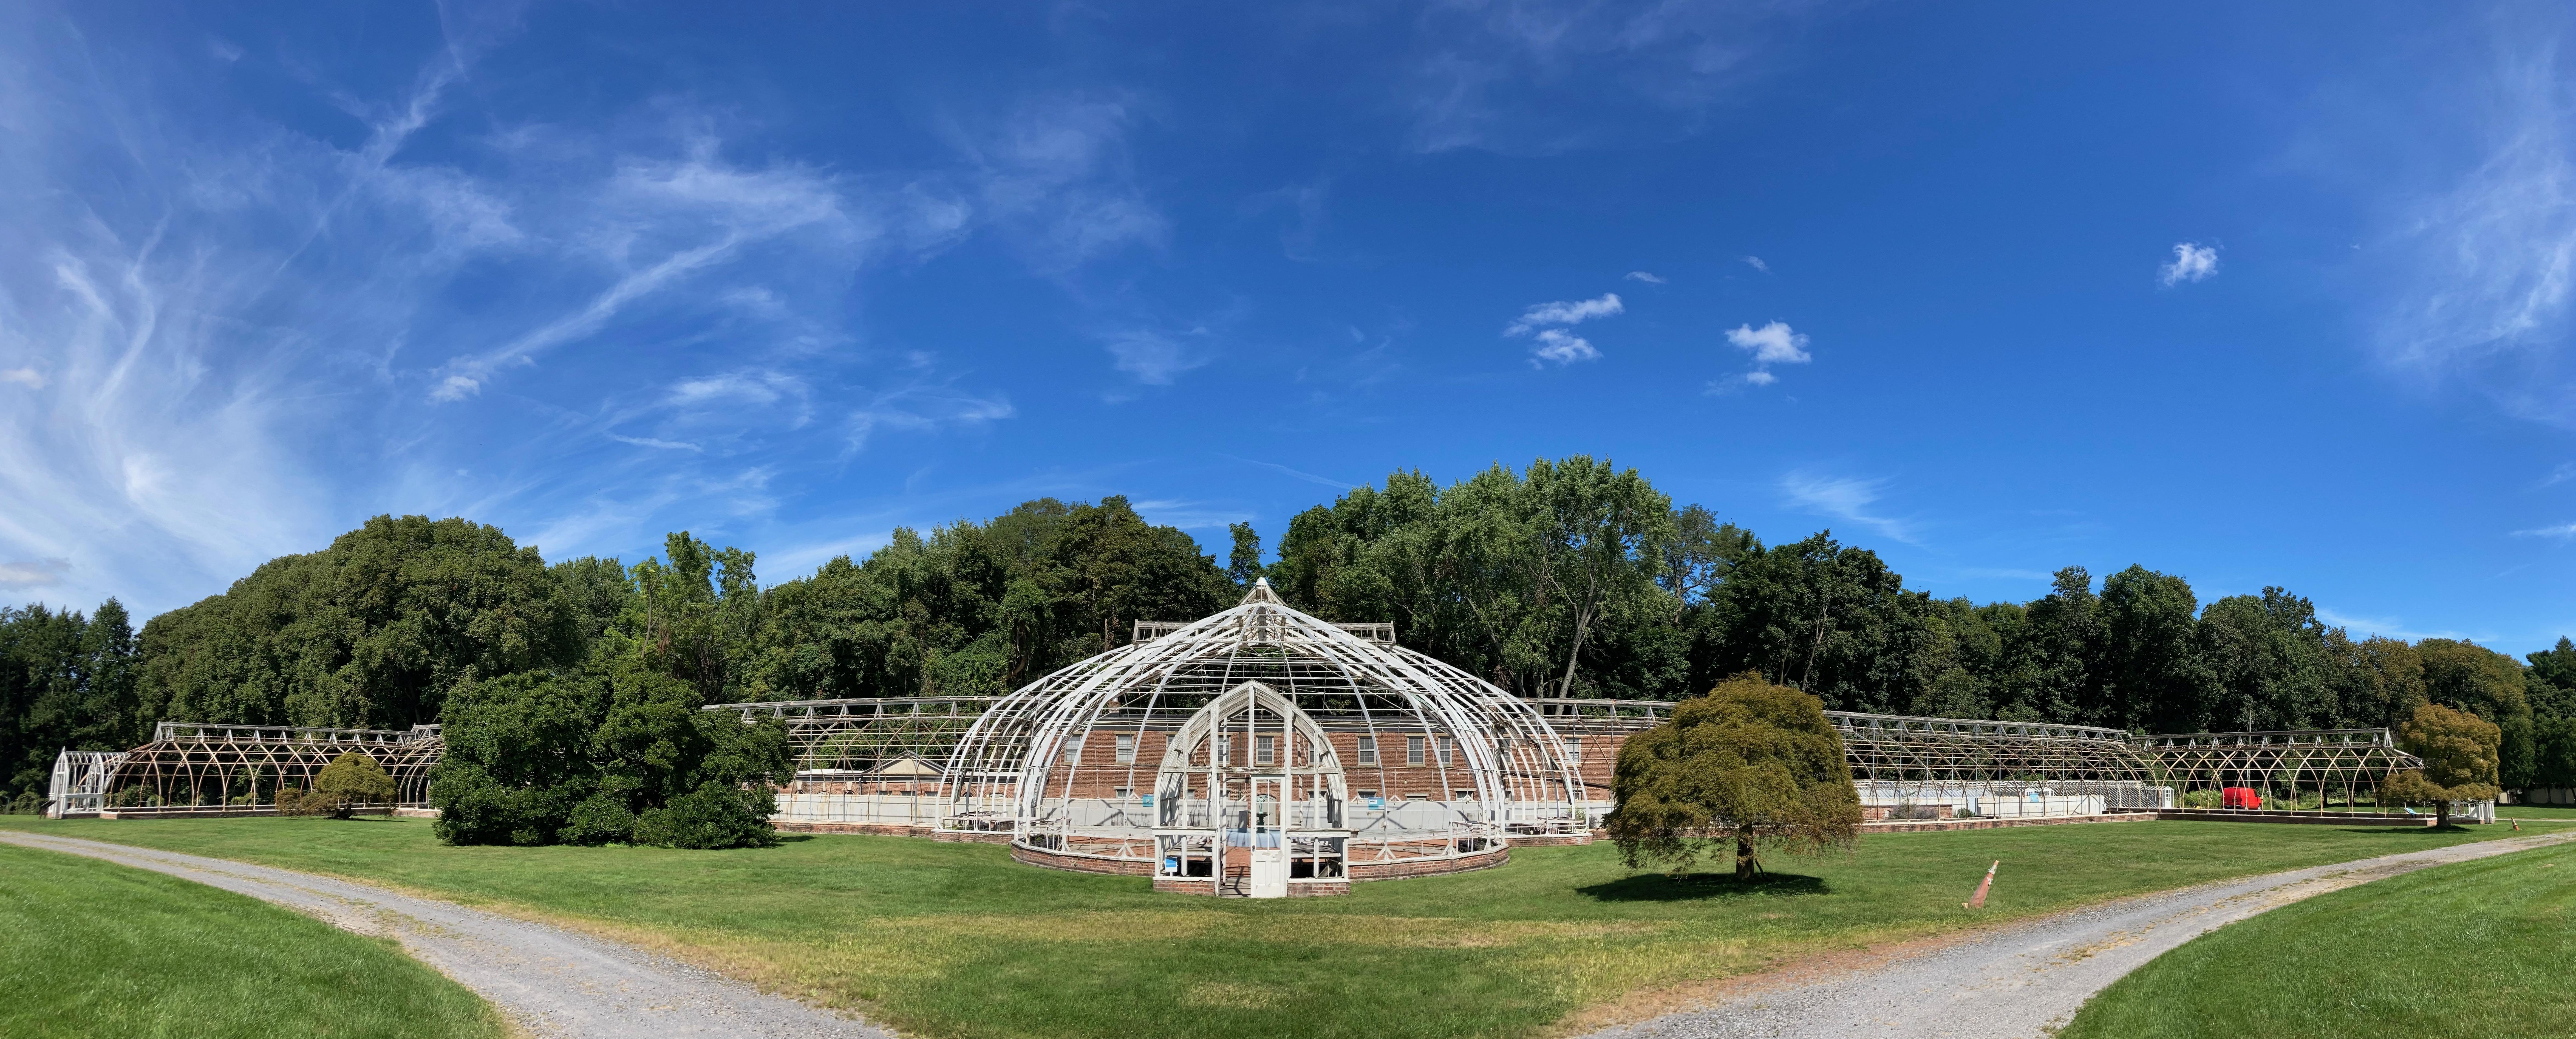 Panorama of Greenhouse.